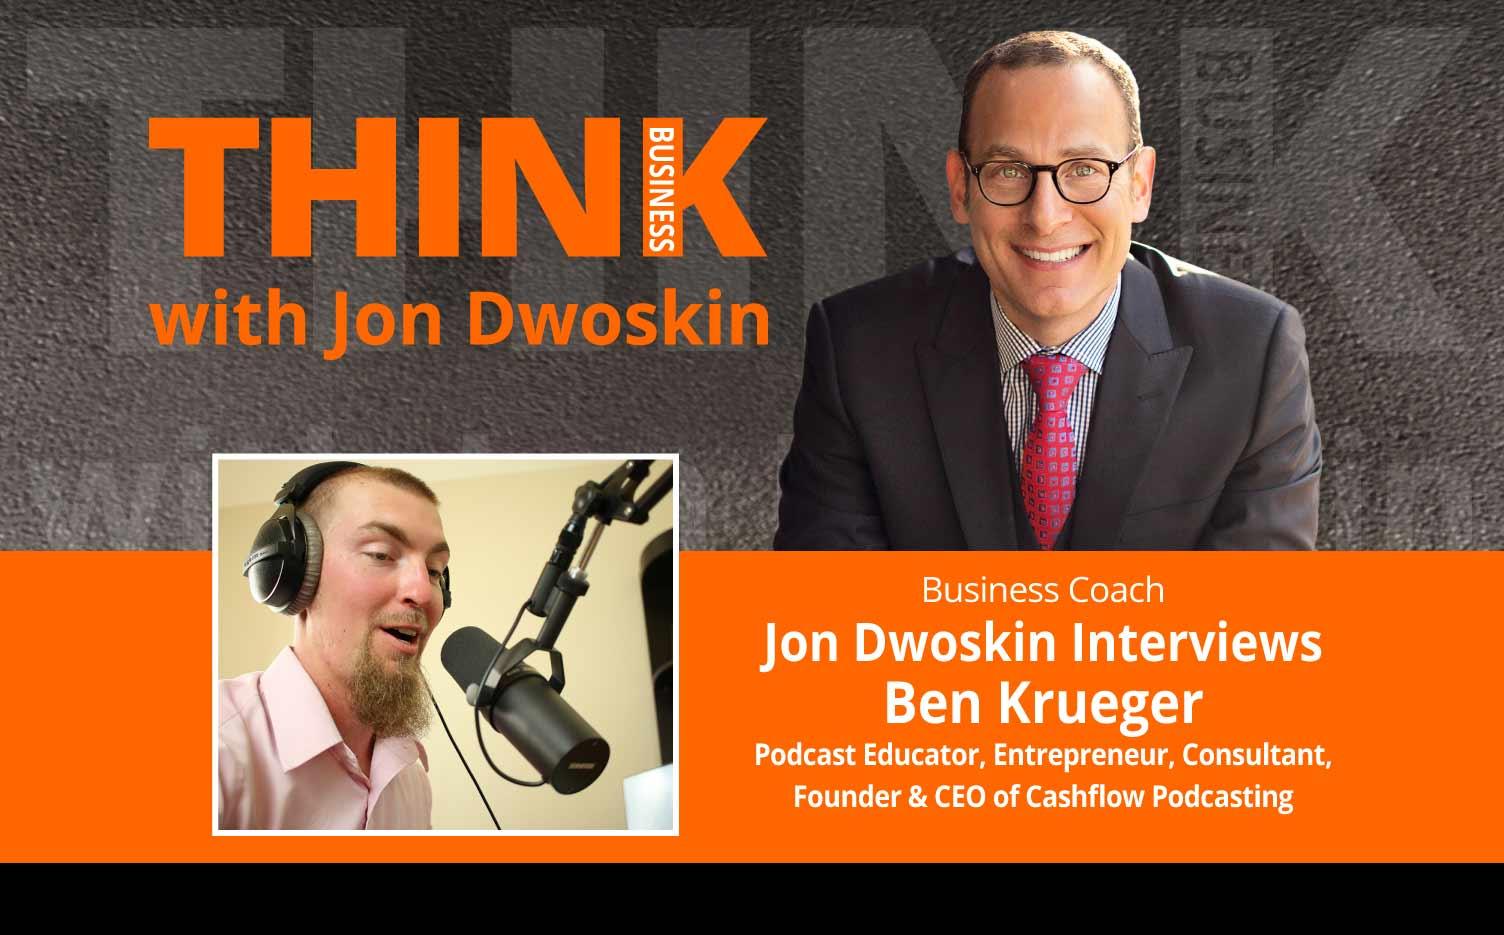 THINK Business Podcast: Jon Dwoskin Interviews Ben Krueger, Podcast Educator, Entrepreneur, Consultant, Founder & CEO of Cashflow Podcasting